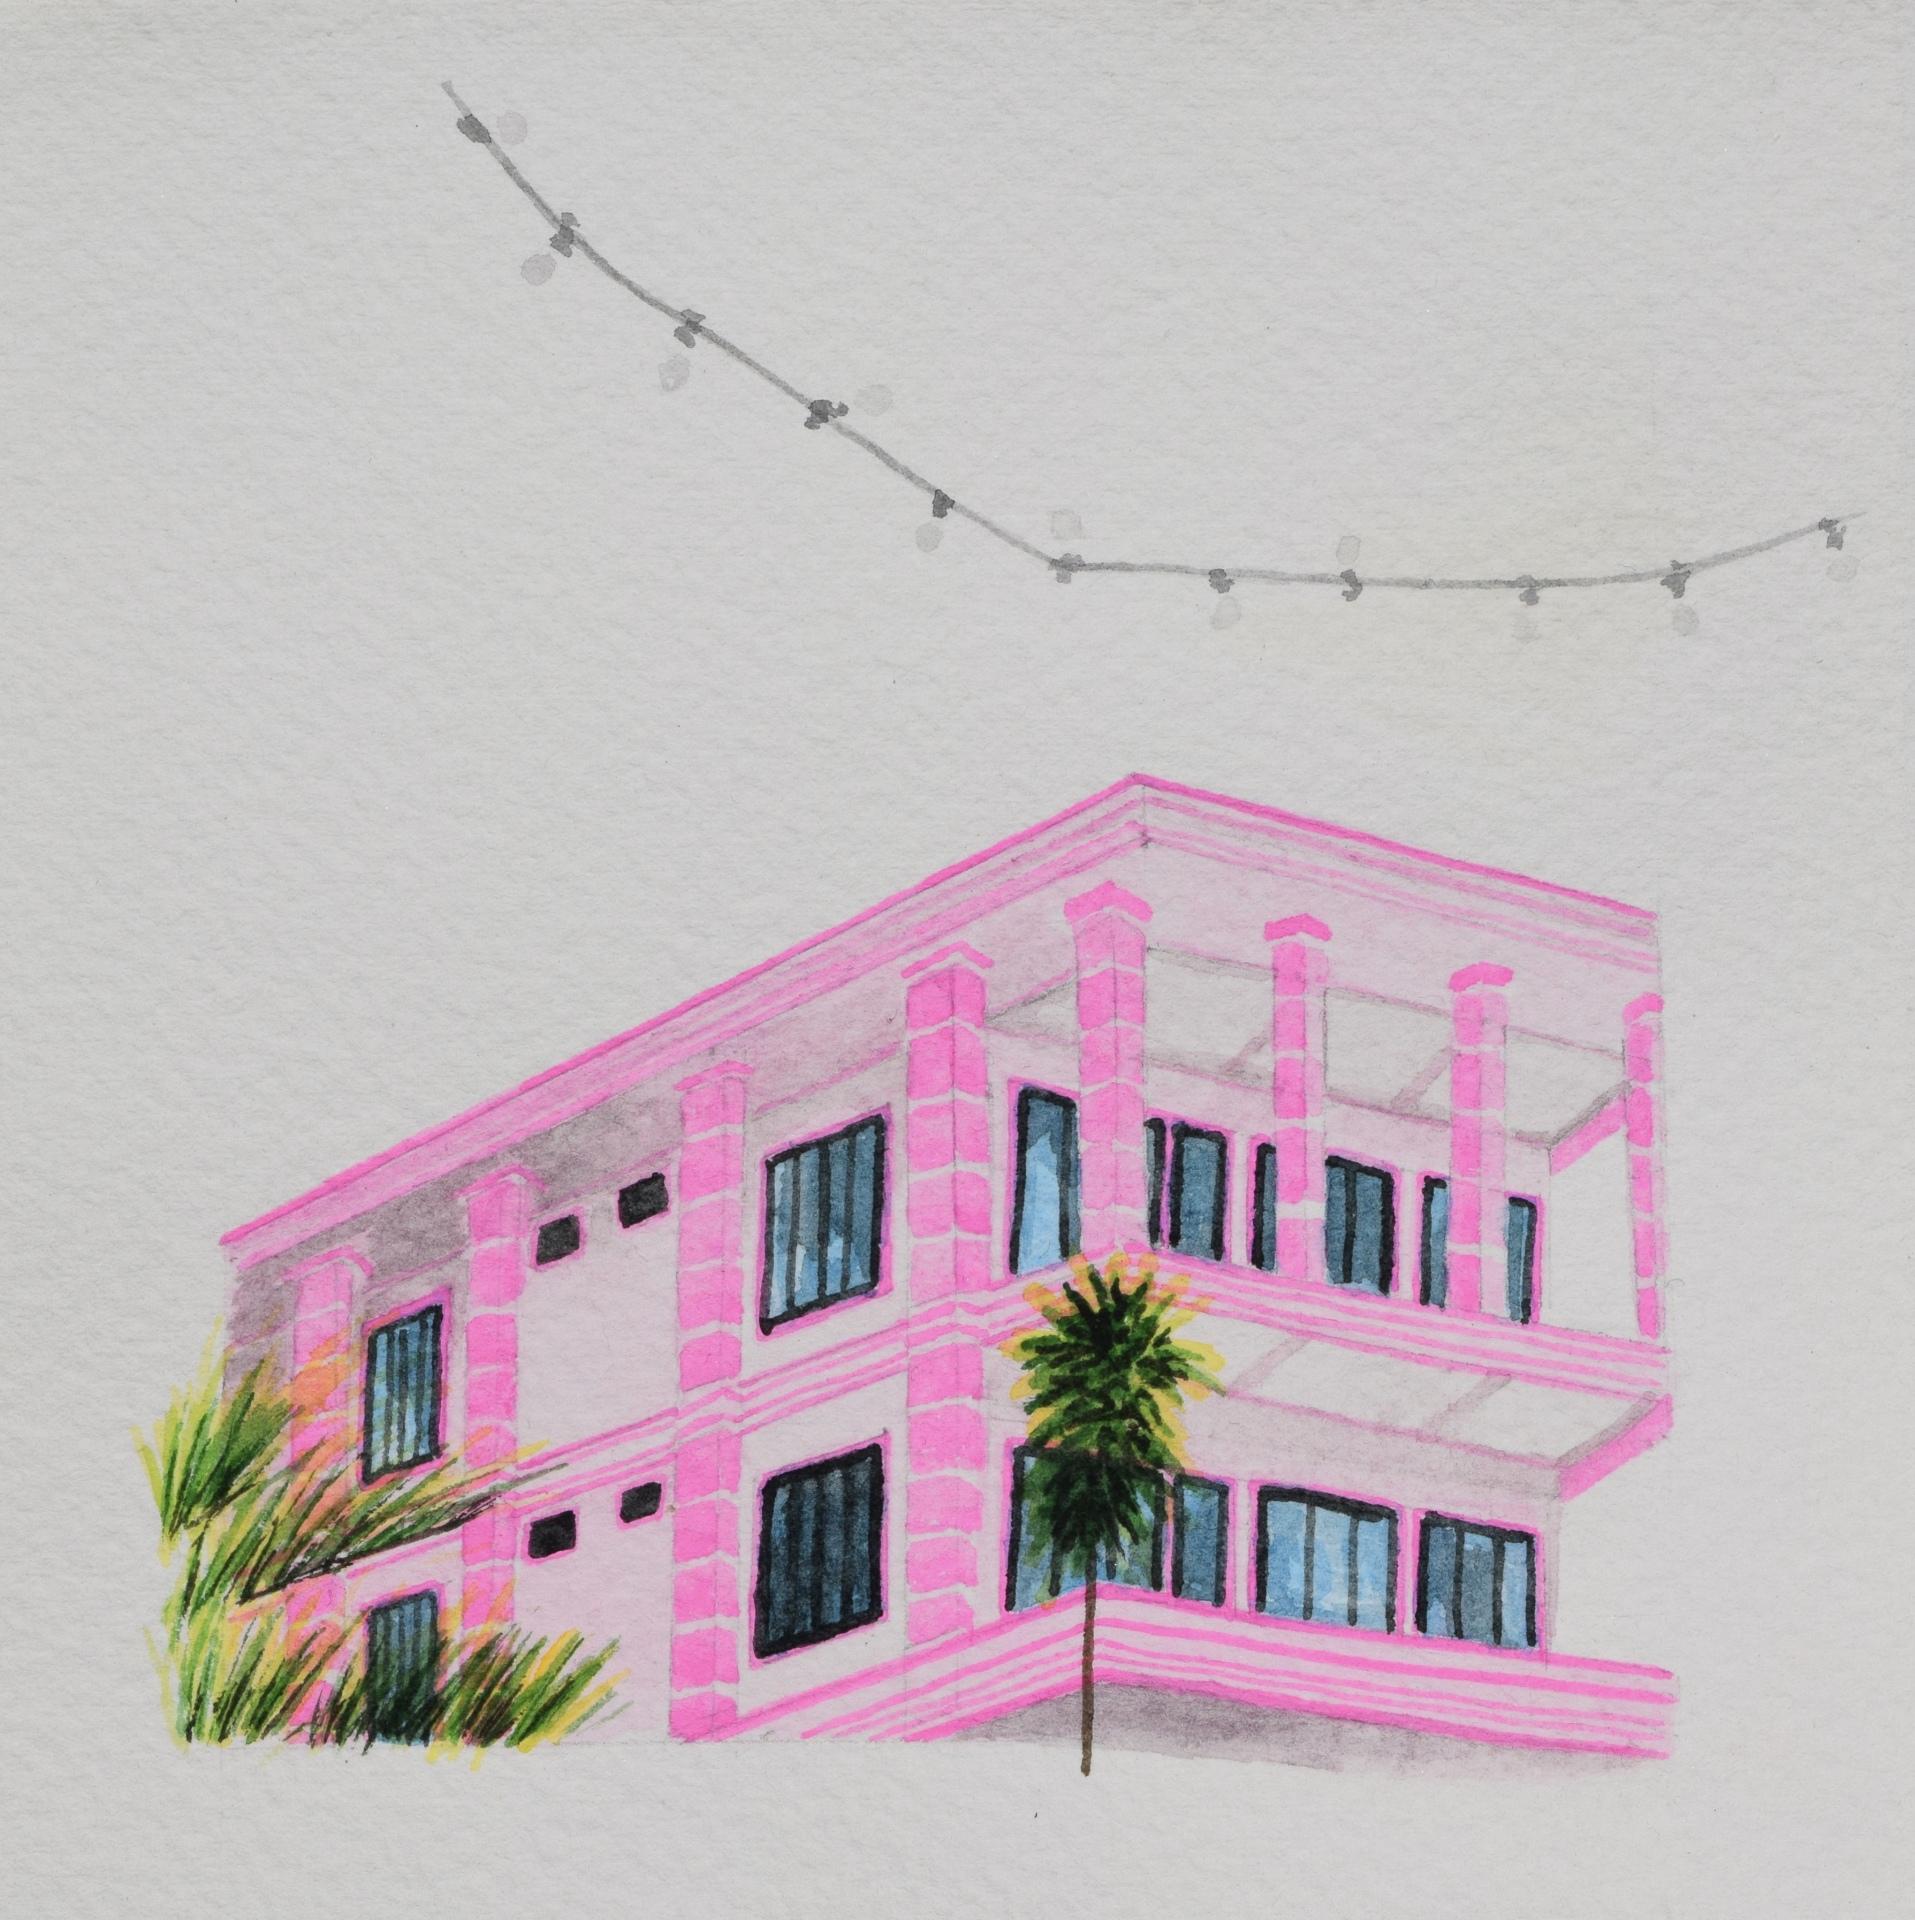 ACID HOUSE LAOS